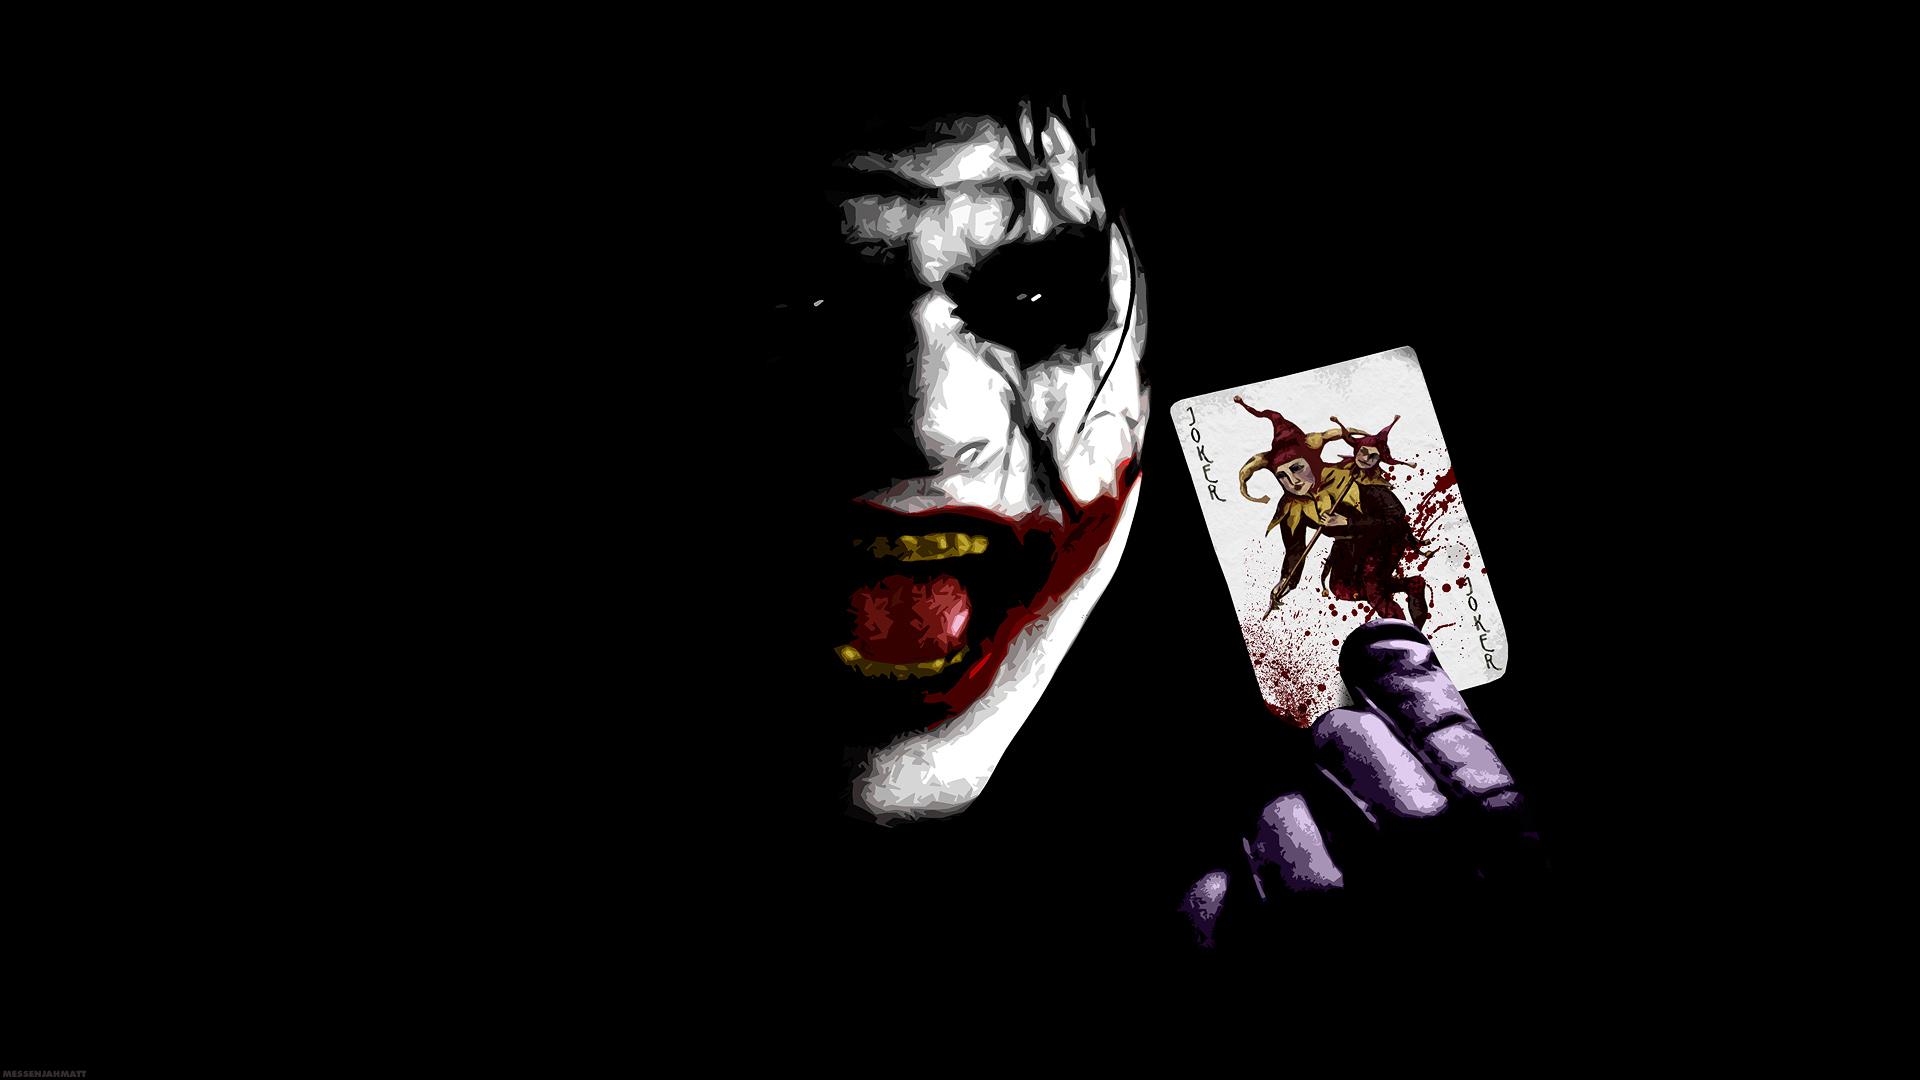 Hd wallpaper of joker - Hd Wallpaper Of Joker 10